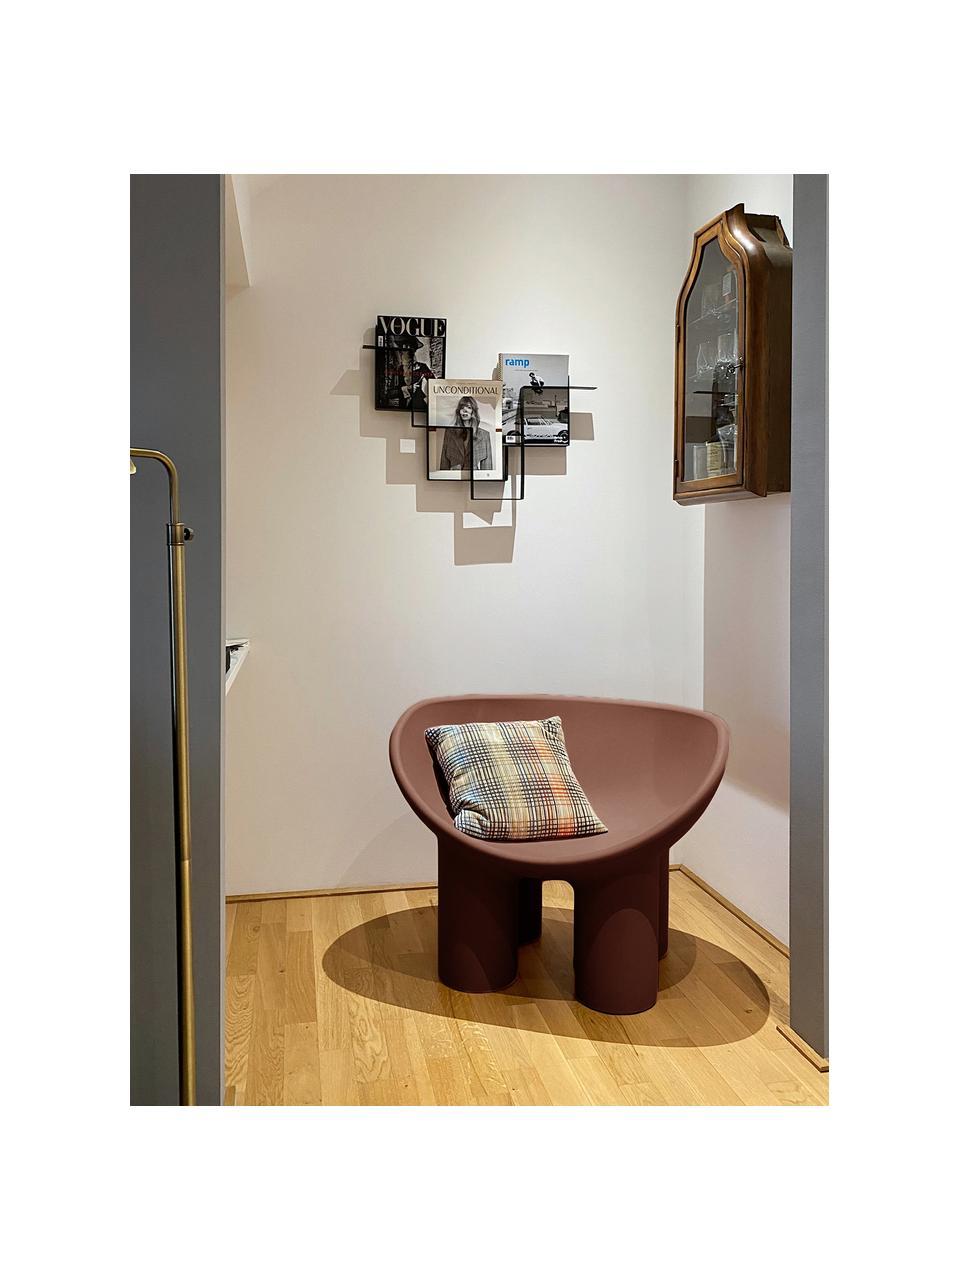 Designer Sessel Roly Poly in Braun, Polyethylen, im Rotationsgussverfahren hergestellt, Braun, B 84 x T 57 cm